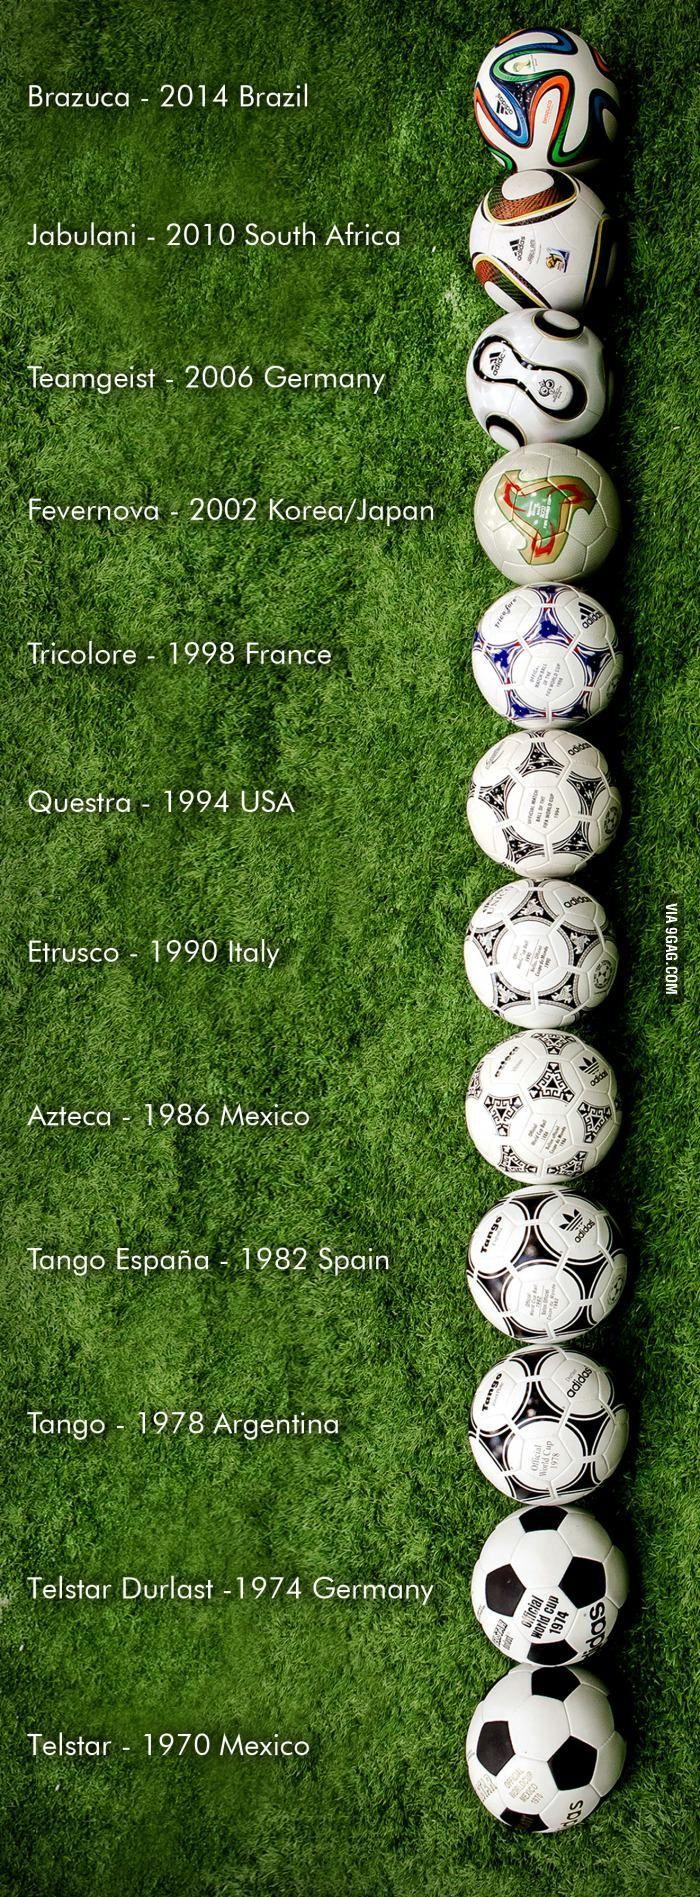 Official FIFA World Cup match balls since 1970